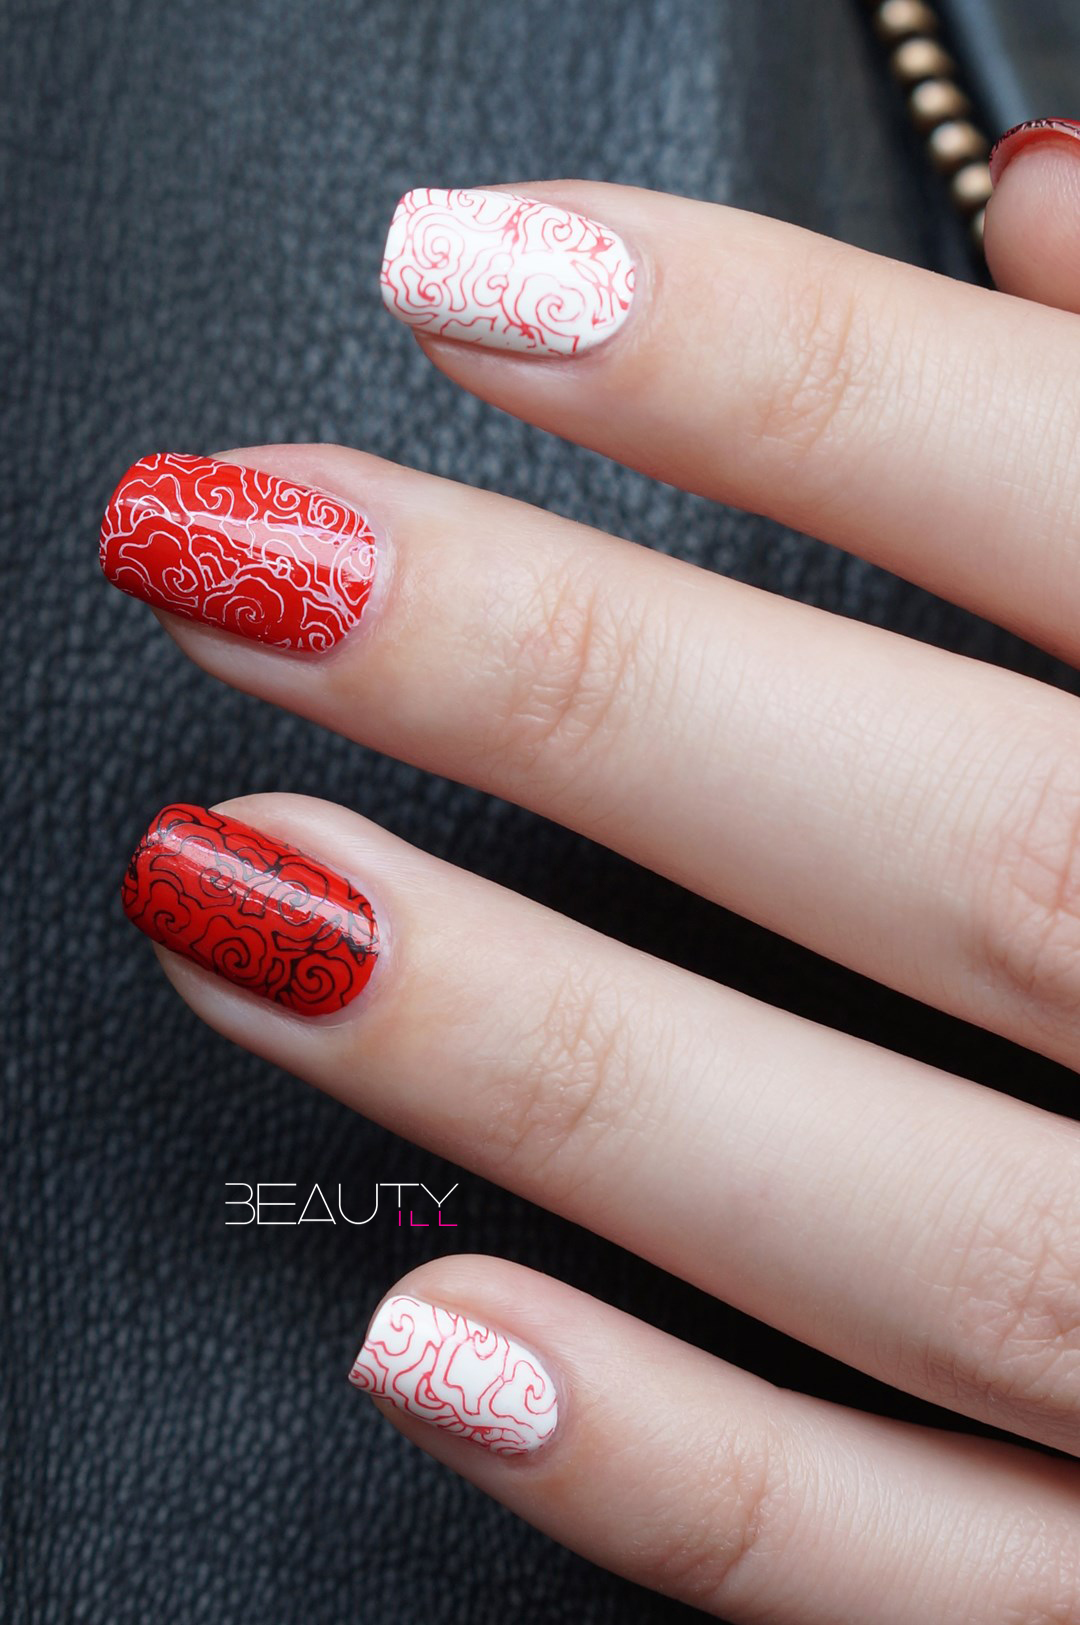 Clear Jelly Stamper Prettypolish + Valentine nail art